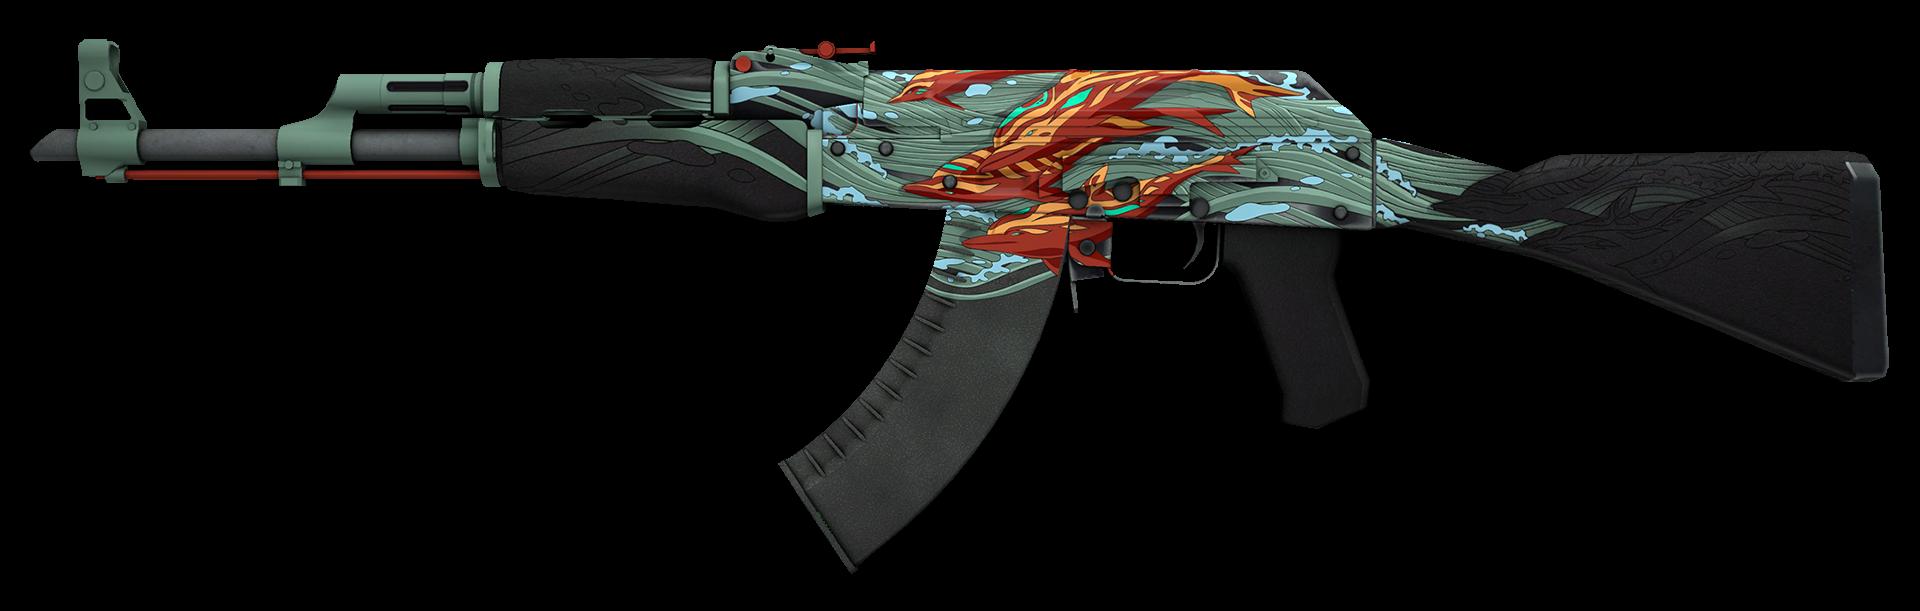 AK-47 Aquamarine Revenge Large Rendering